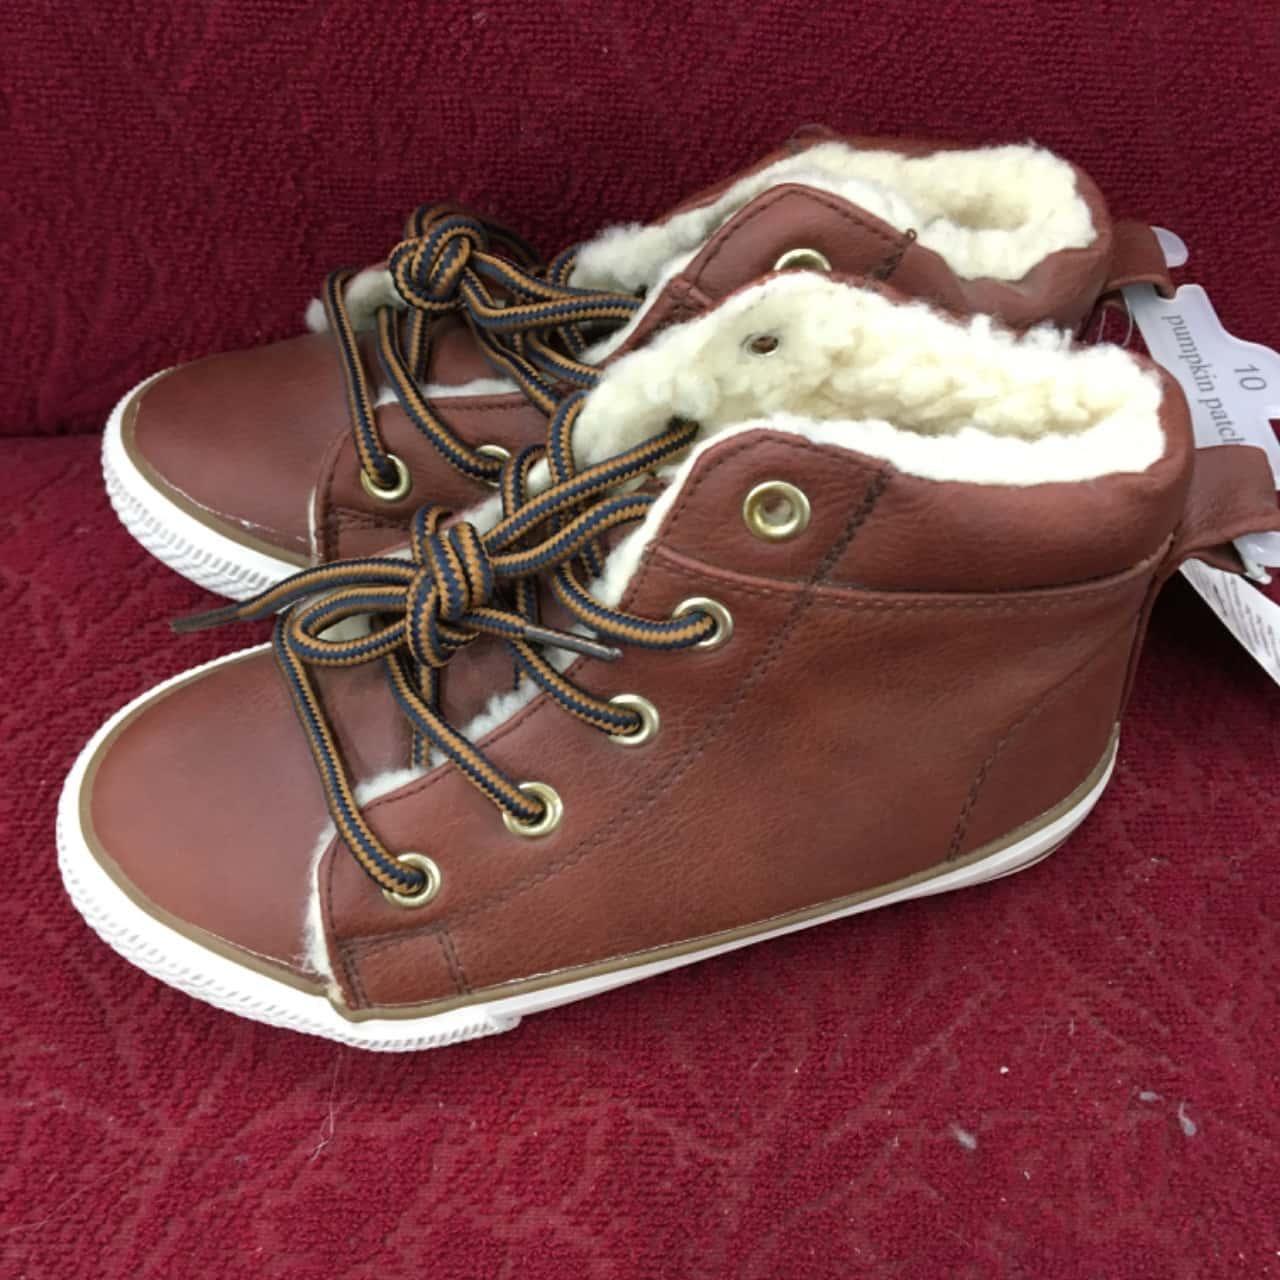 Pumpkin Patch Kids  Size 10 Shoes Brown